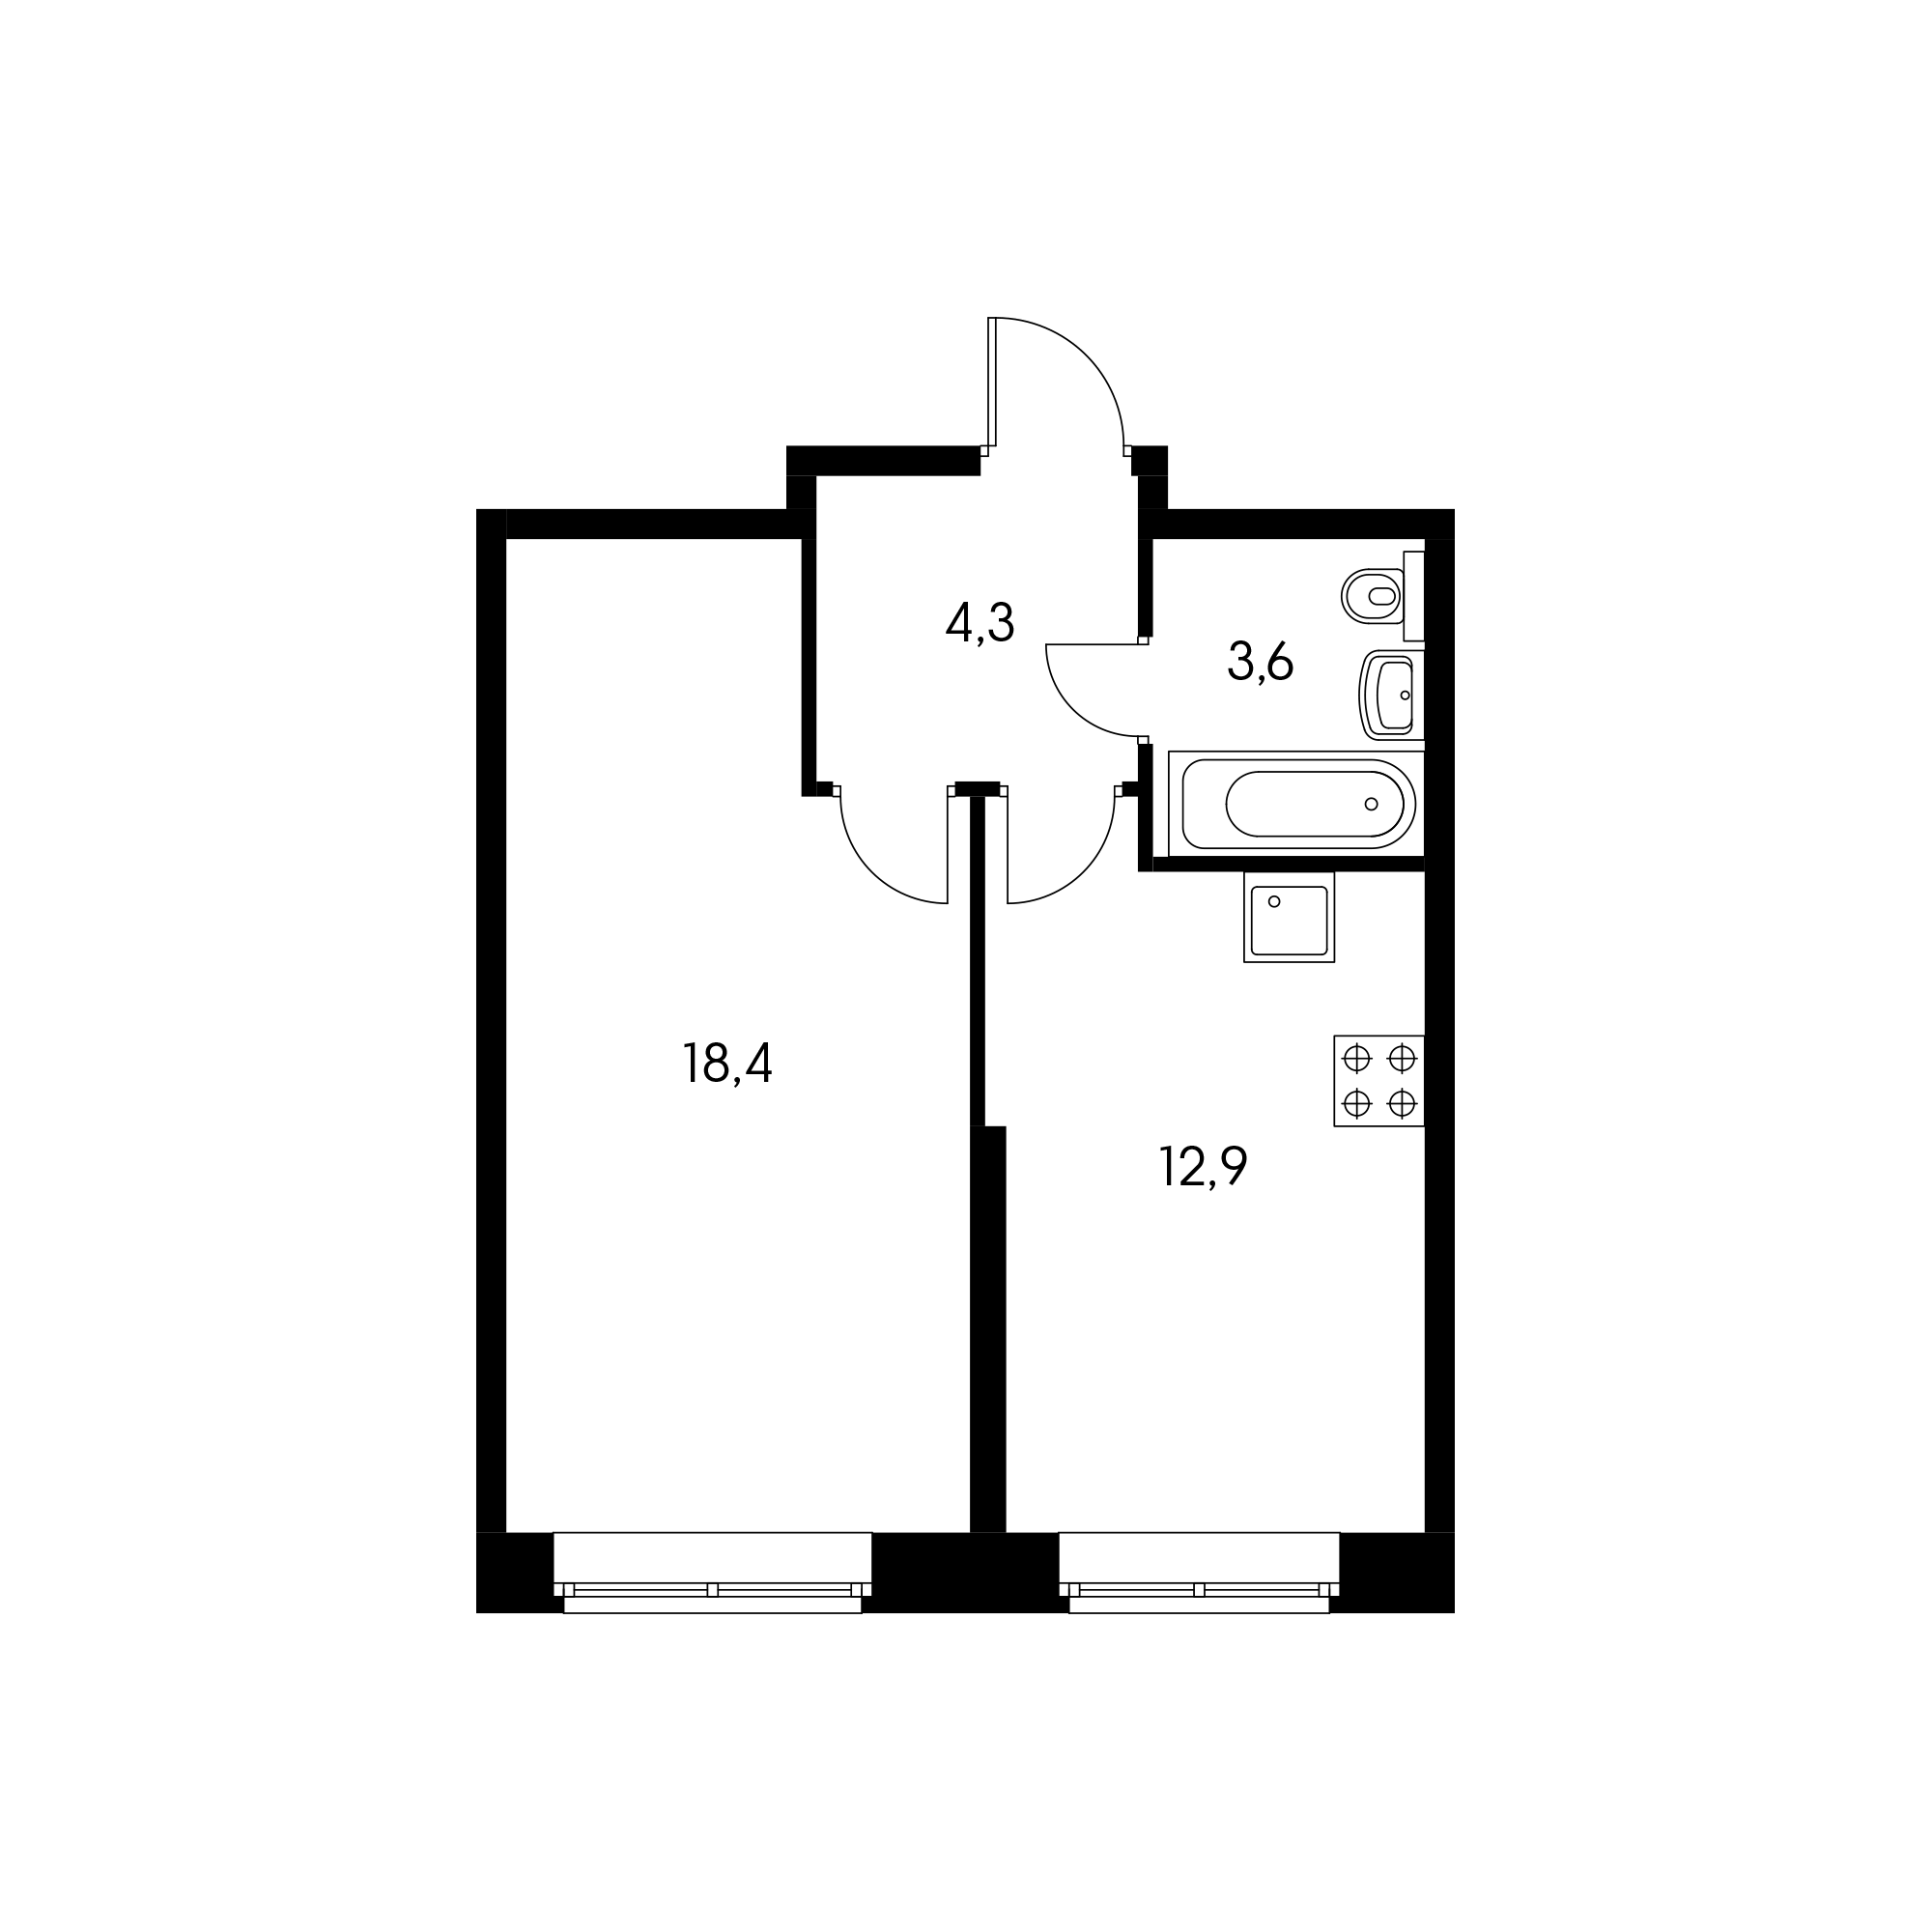 1KM1_6.3-2*